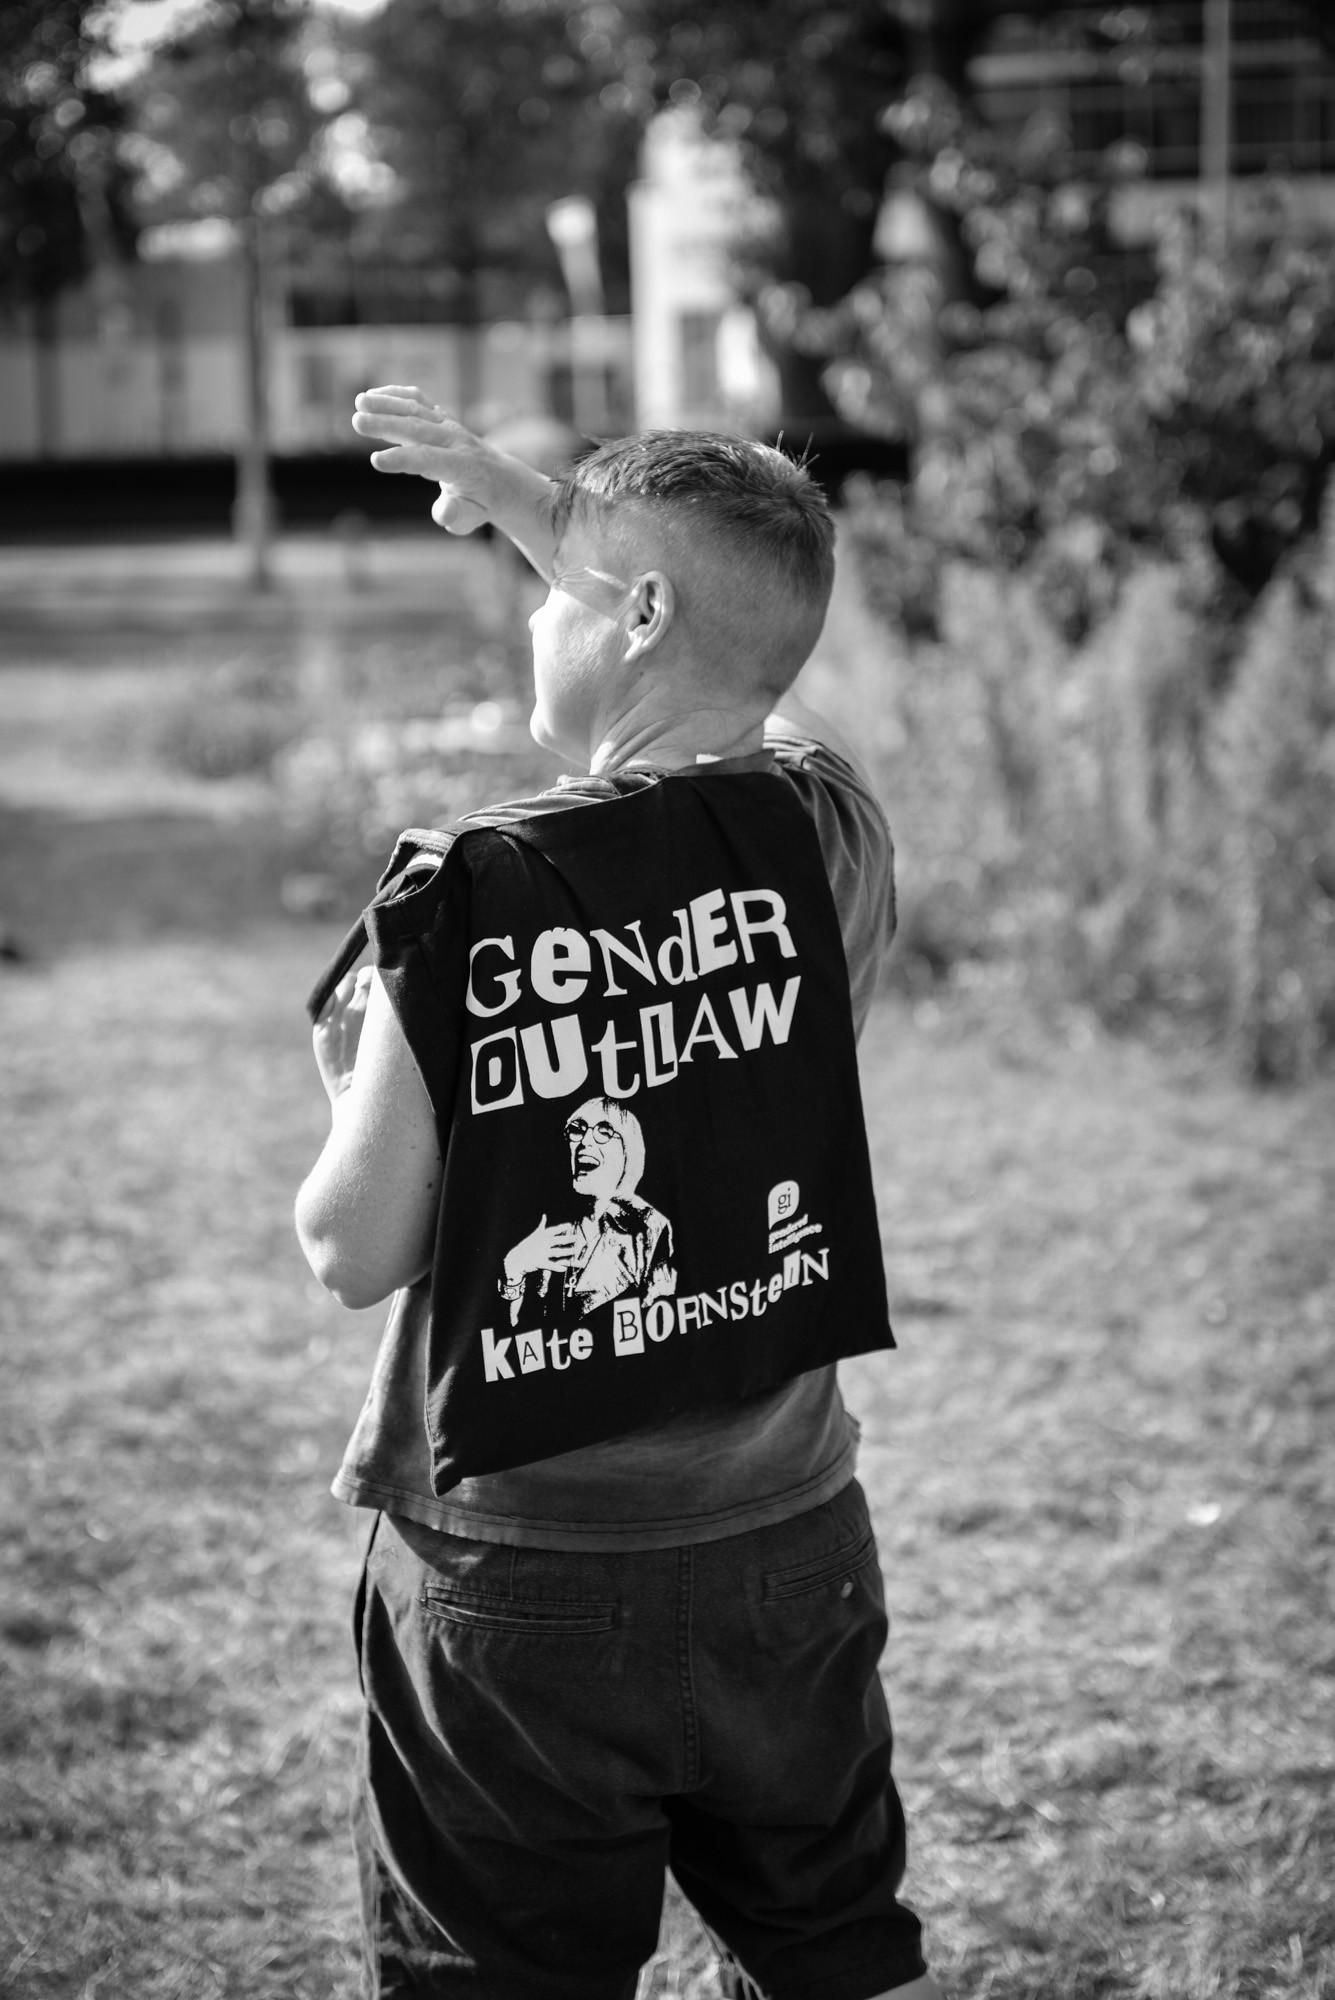 Gender outlaw in Amsterdam, Kate Bornstein jacket